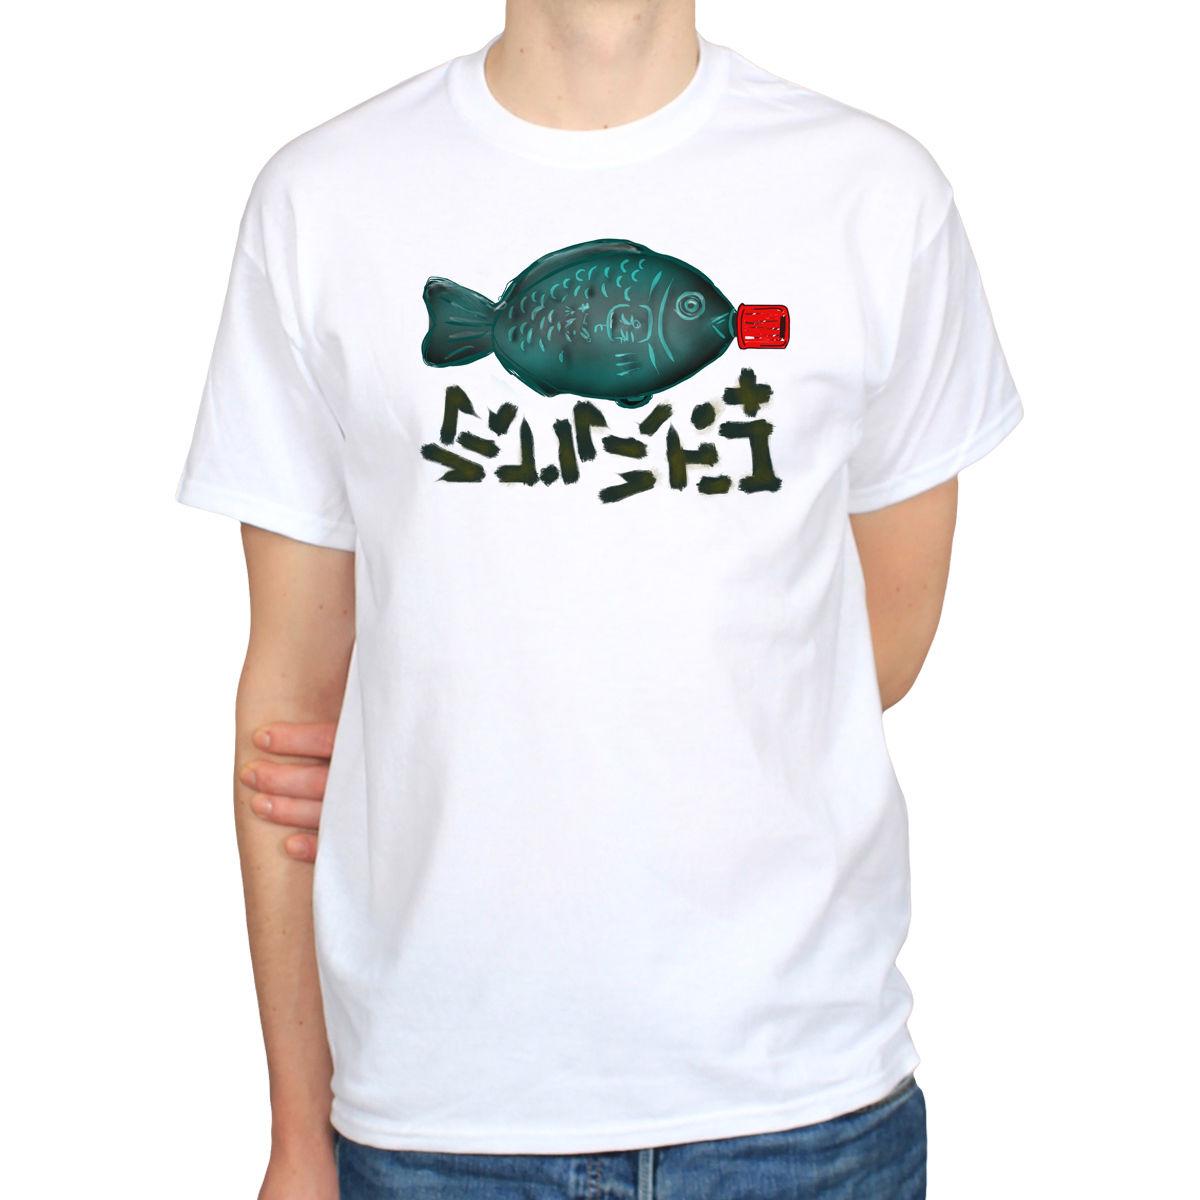 T shirt japanese design - Soy Sauce Fish Sushi Japanese Street Art Hipster Japan Design Mens T Shirt Tee Brand Cotton Men Clothing Male Slim Fit T Shirt